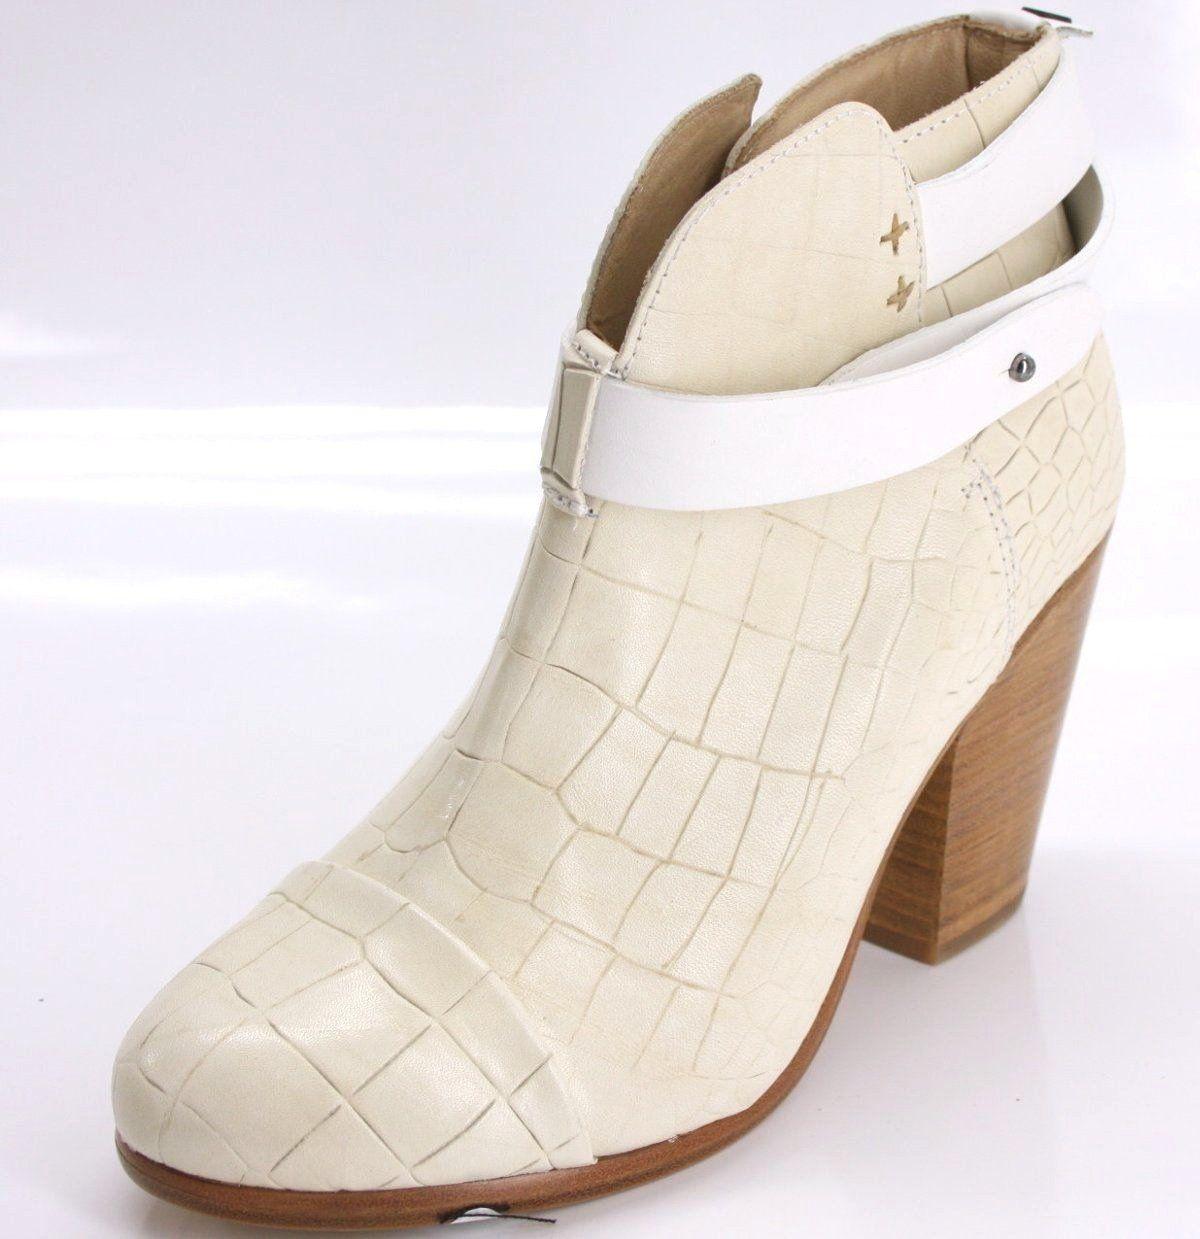 Rag \u0026 Bone Ivory Leather Harrow Ankle